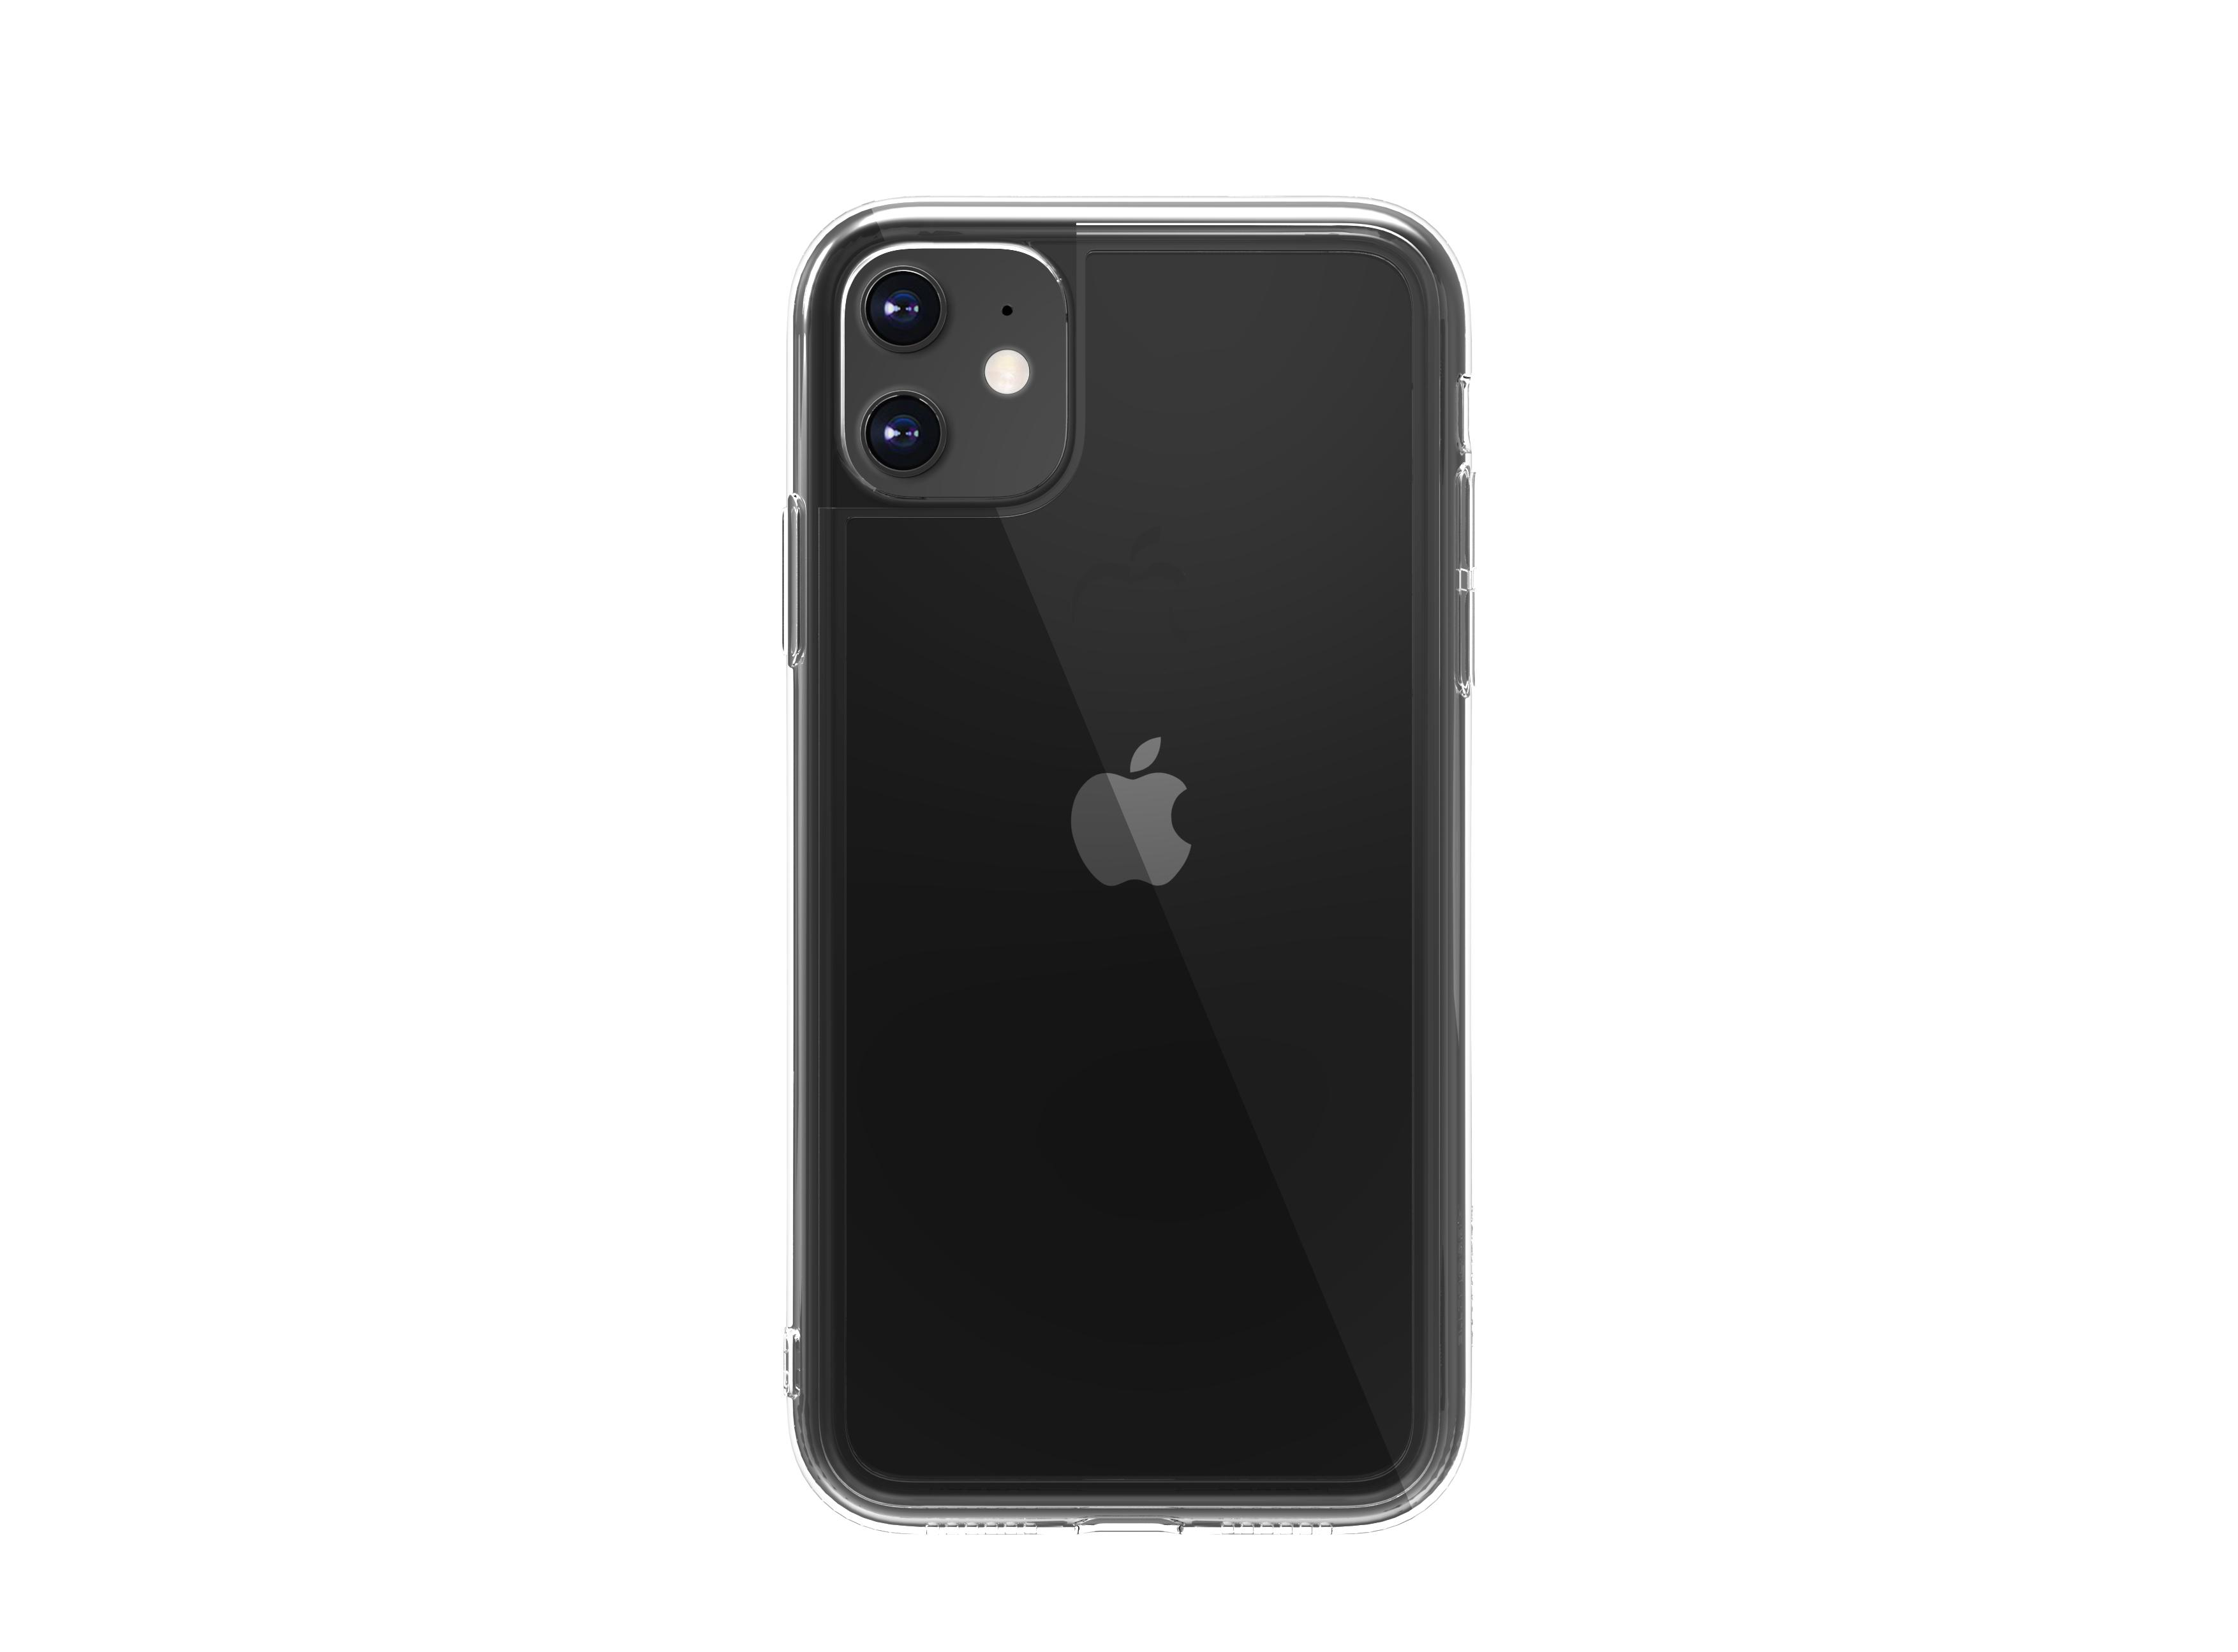 iPhone11-Black for linkase air ADM